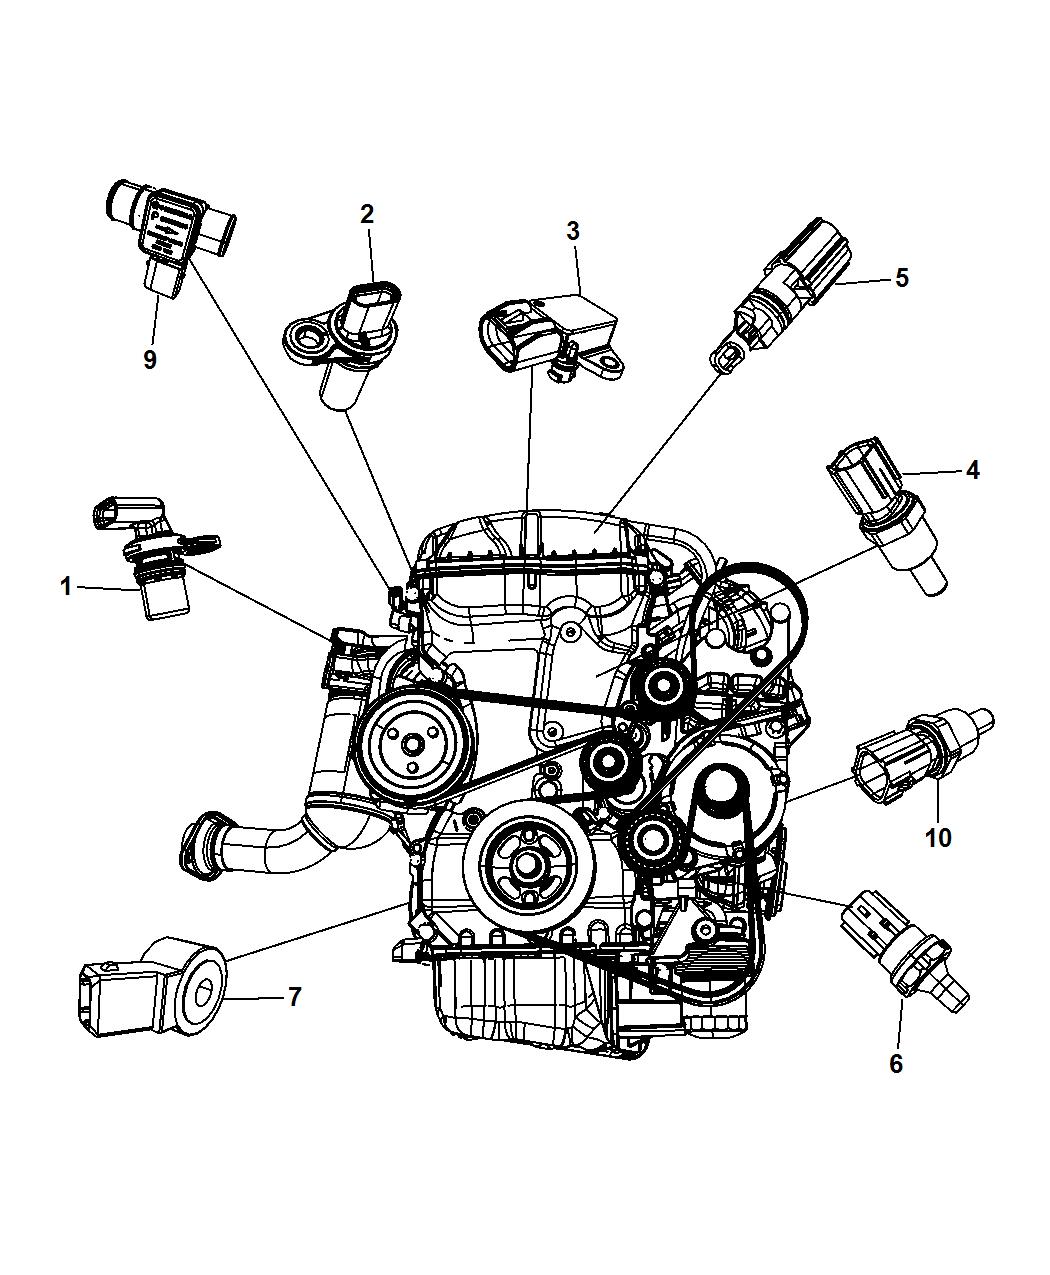 2011 Chrysler 200 Engine Diagram Wiring Diagram Center Sound Minor Sound Minor Tatikids It